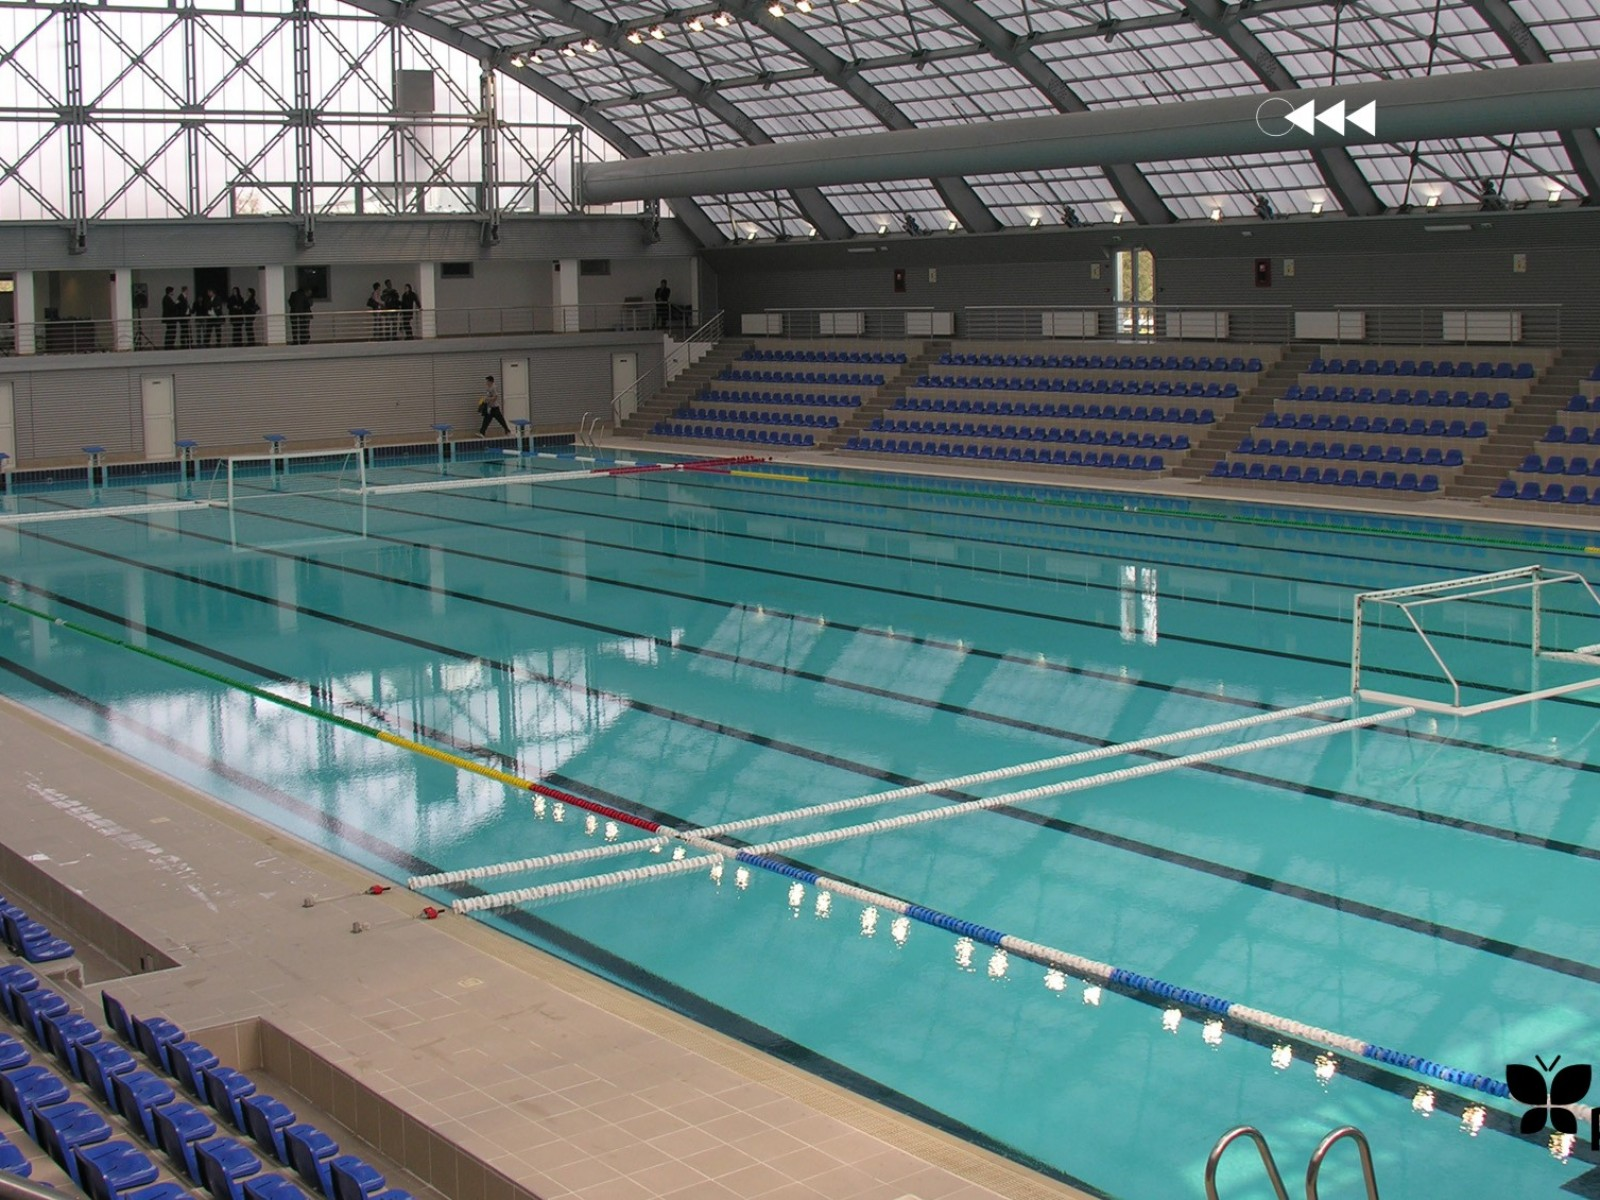 swimming pool ventilation ducting